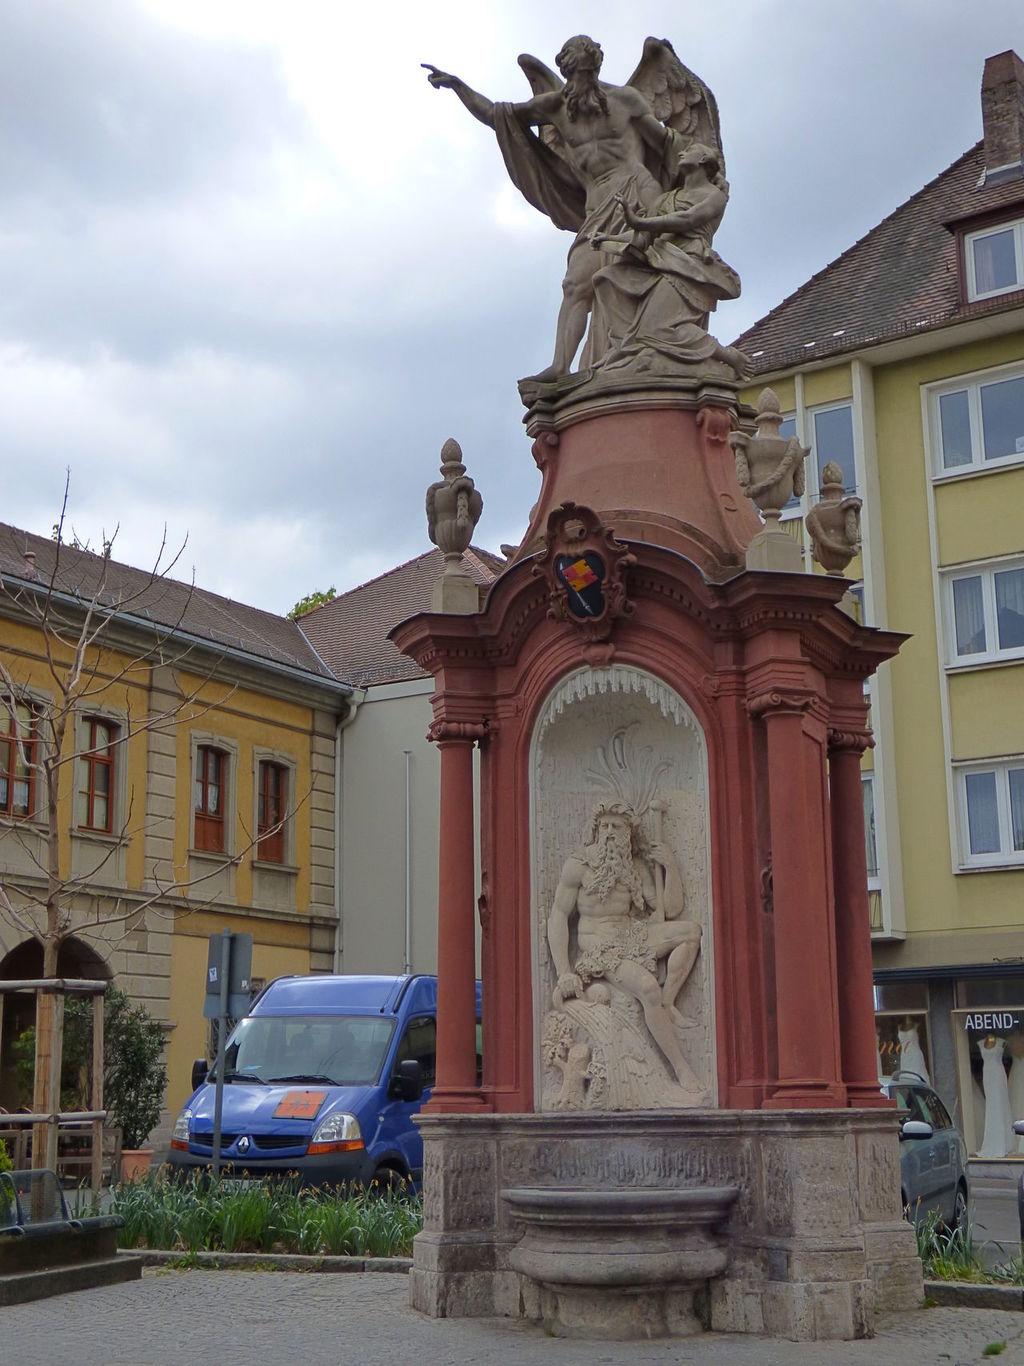 20160427_Wuerburg_049